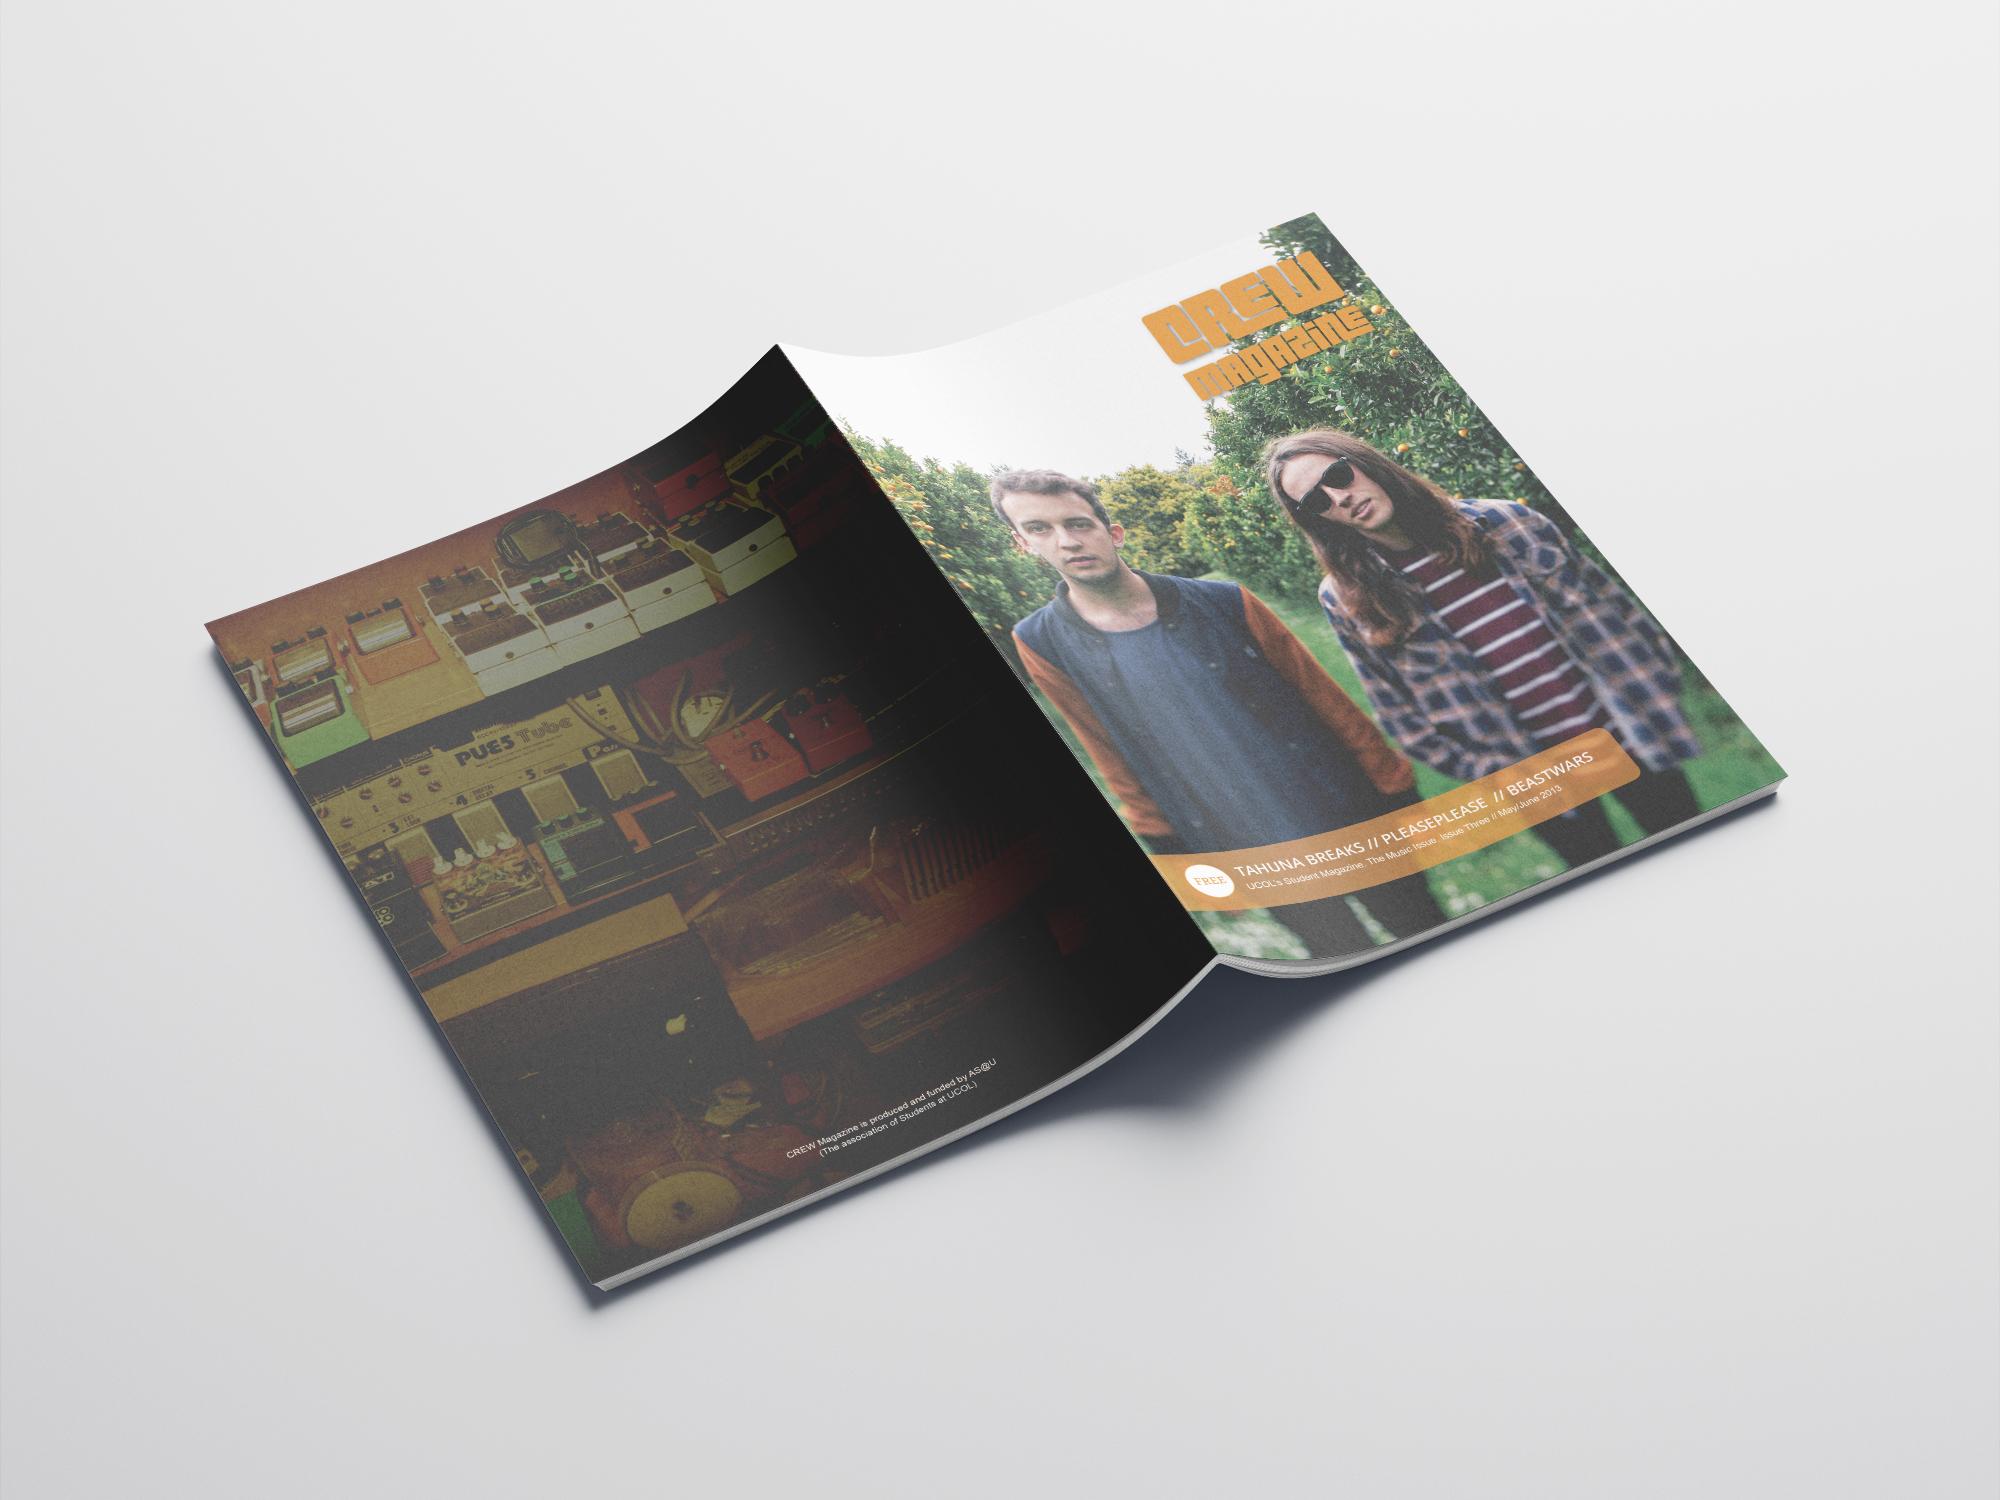 crew-music-2013-cover.jpg